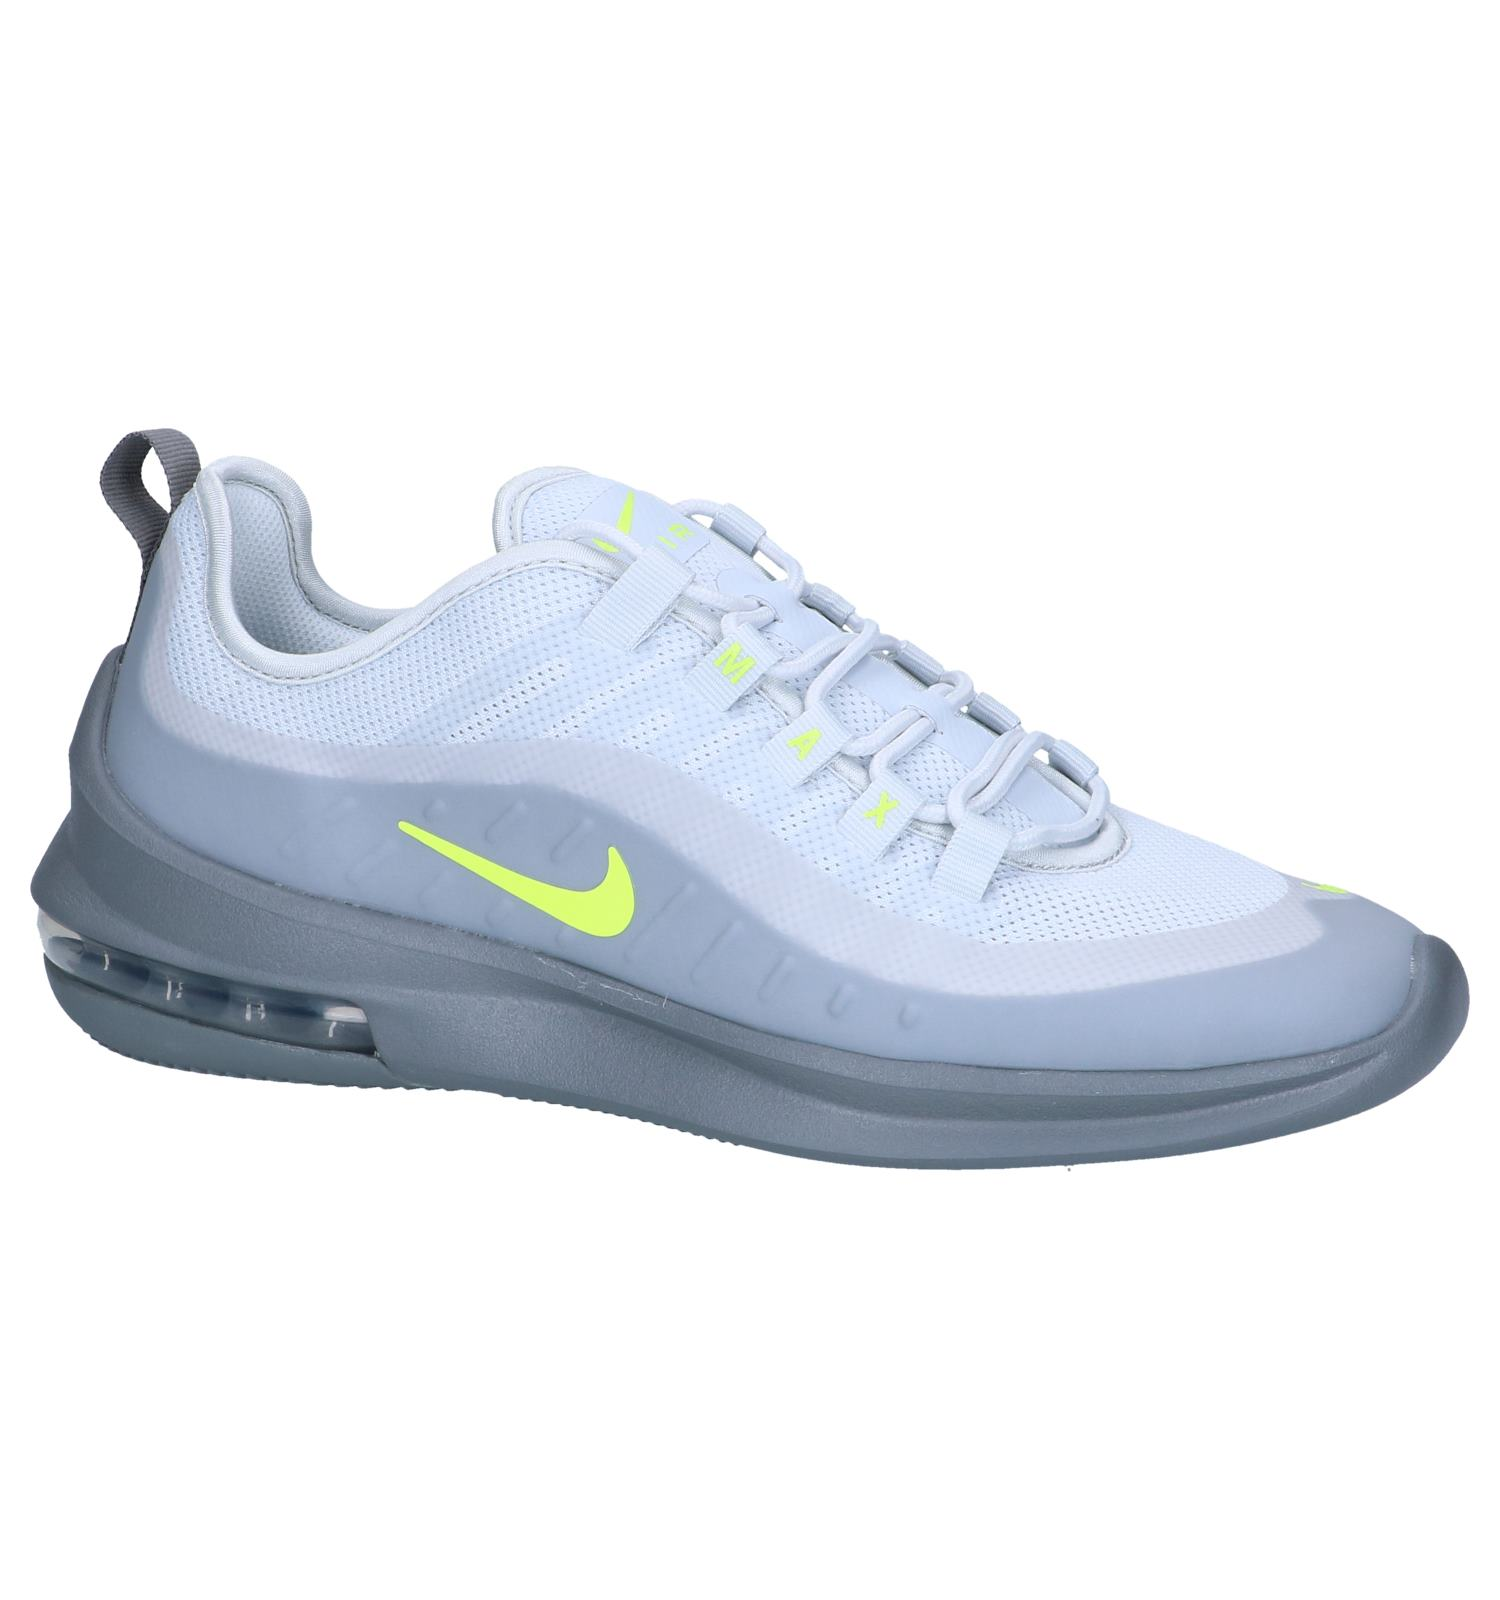 Lichtgrijze Sneakers Nike Air Max Axis | SCHOENENTORFS.NL | Gratis verzend en retour